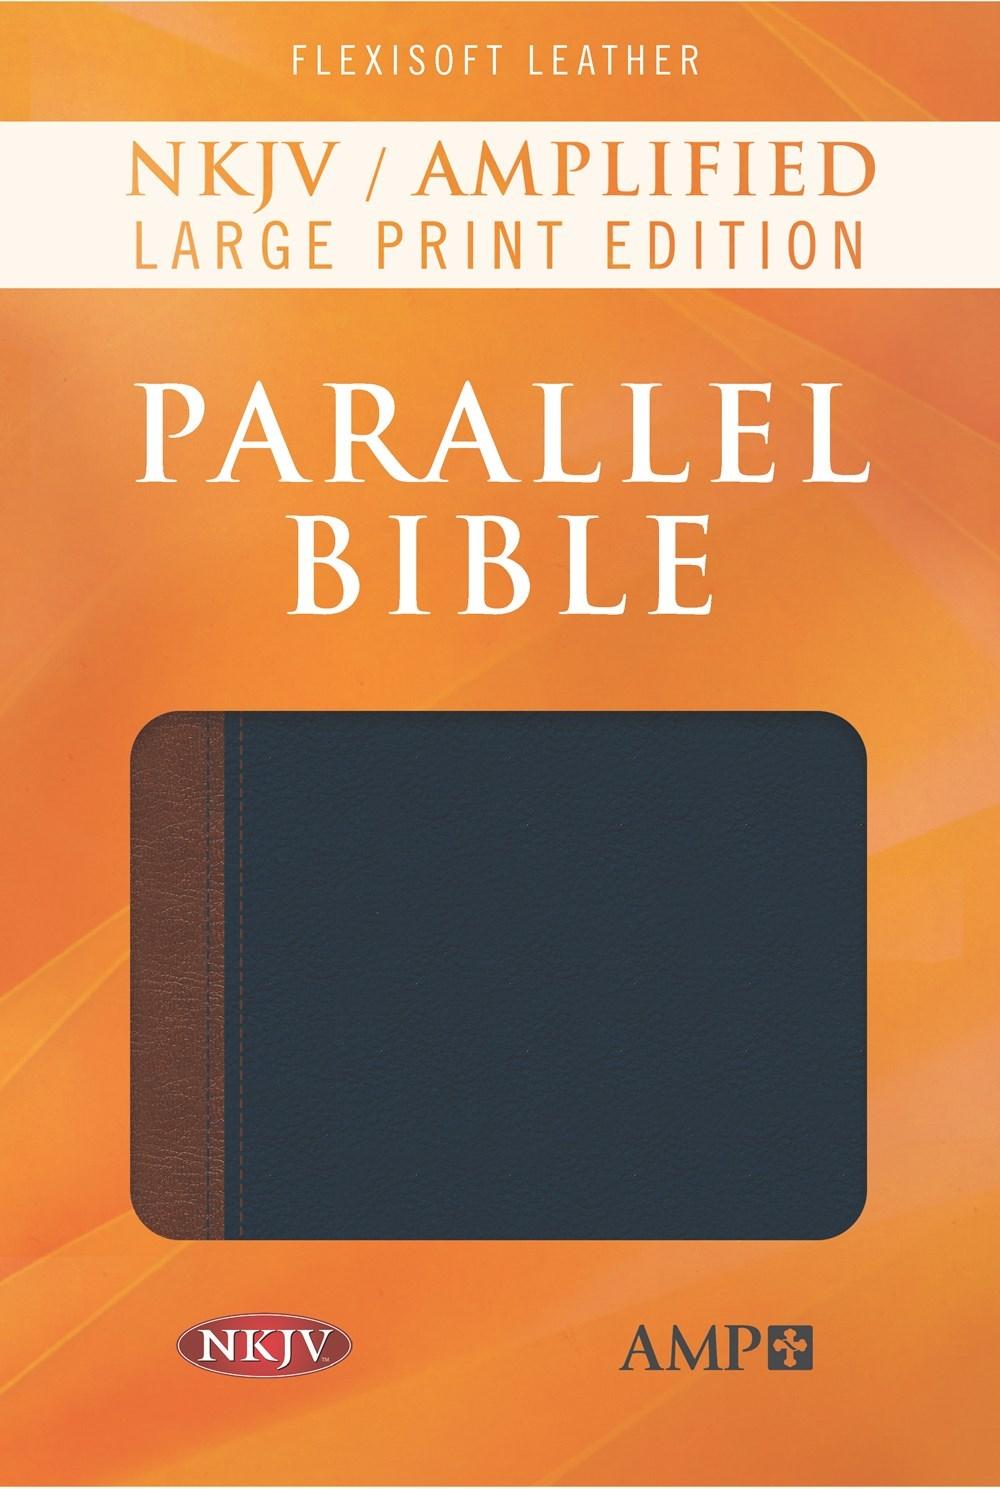 NKJV/Amplified Parallel Bible/Large Print-Blue/Brown Flexisoft Leather